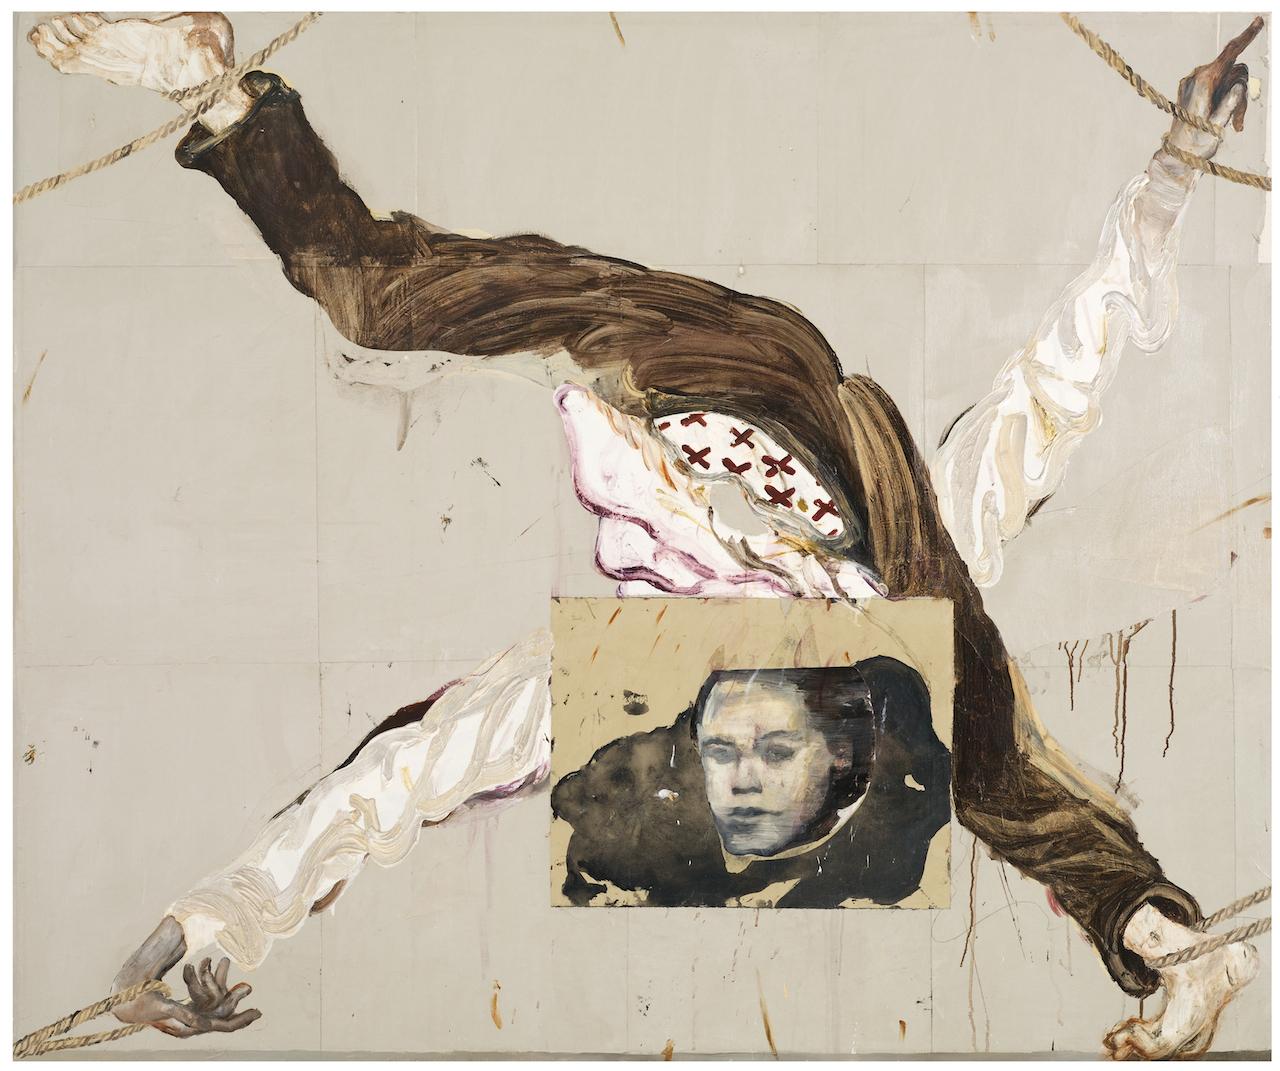 "Reima Nevalainen, ""Framed"" (2014), acrylic and collage on canvas, 65 by 79 in. (Rafaela and Kaj Forsblom Collection, Helsinki © Reima Nevalainen, courtesy RKF Collection, photo by Patrik Rastenberger)"